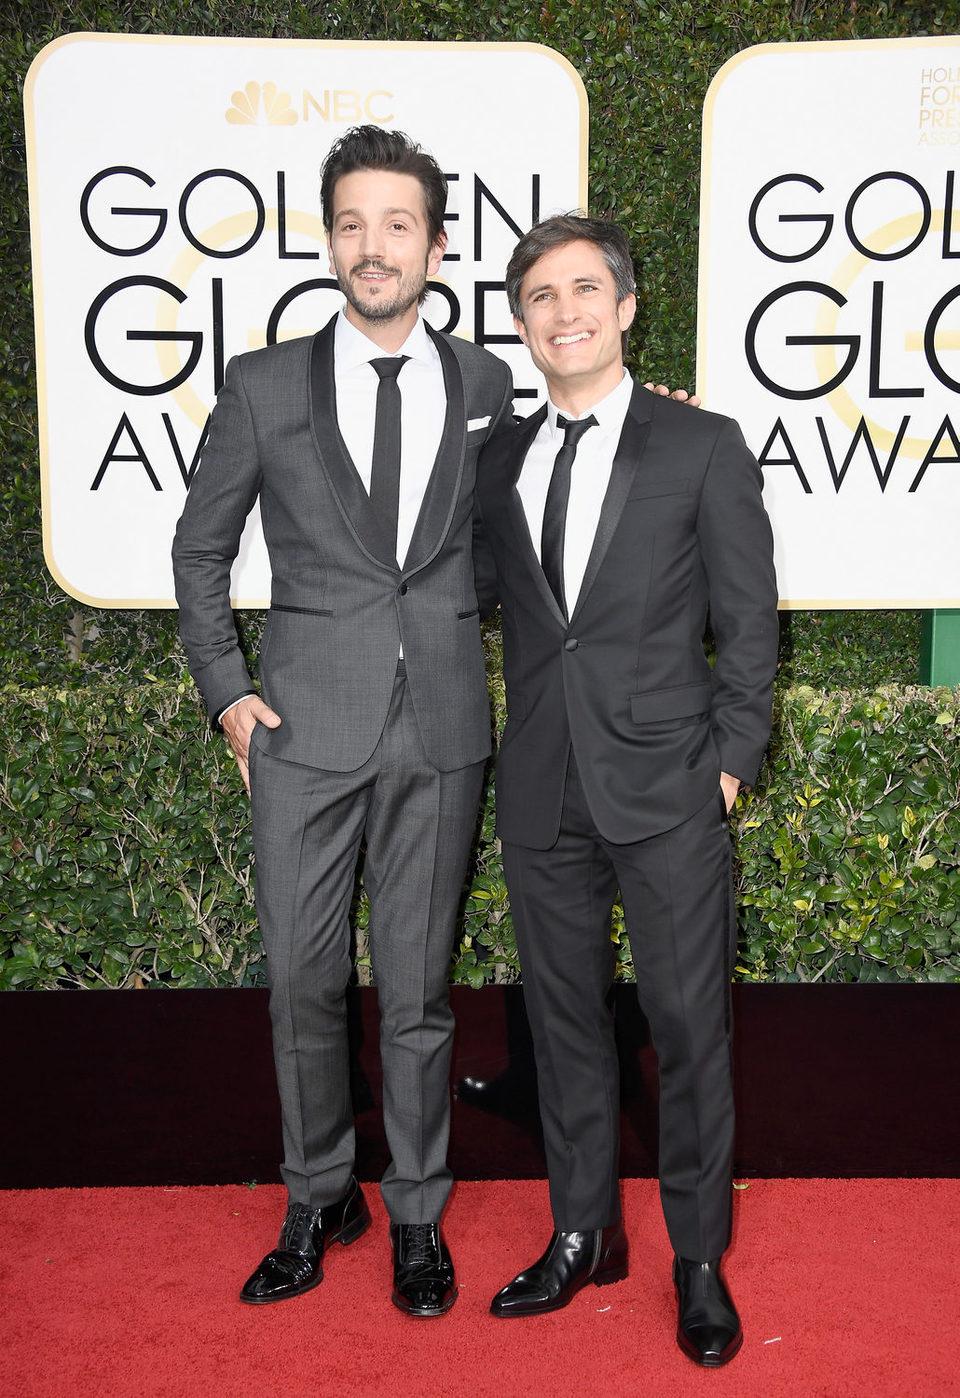 Diego Luna y Gael García Bernal at the 2017 Golden Globes red carpet